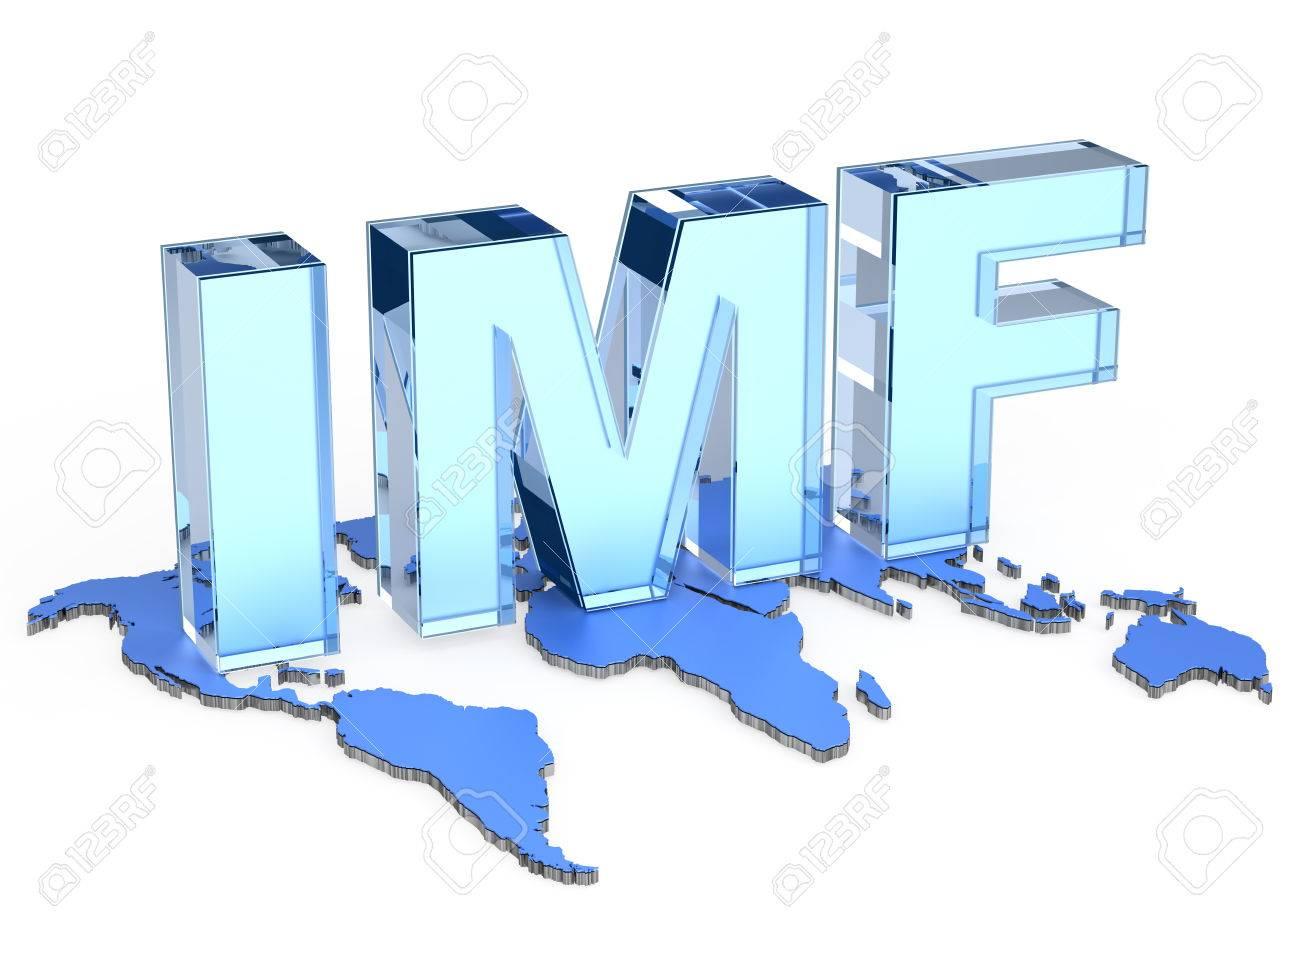 IMF, KEFALET GARANTİSİ SAĞLADI VE YÜZ MİLYONLARCA DOLAR KOMİSYON ALDI MI, ALMADI MI?